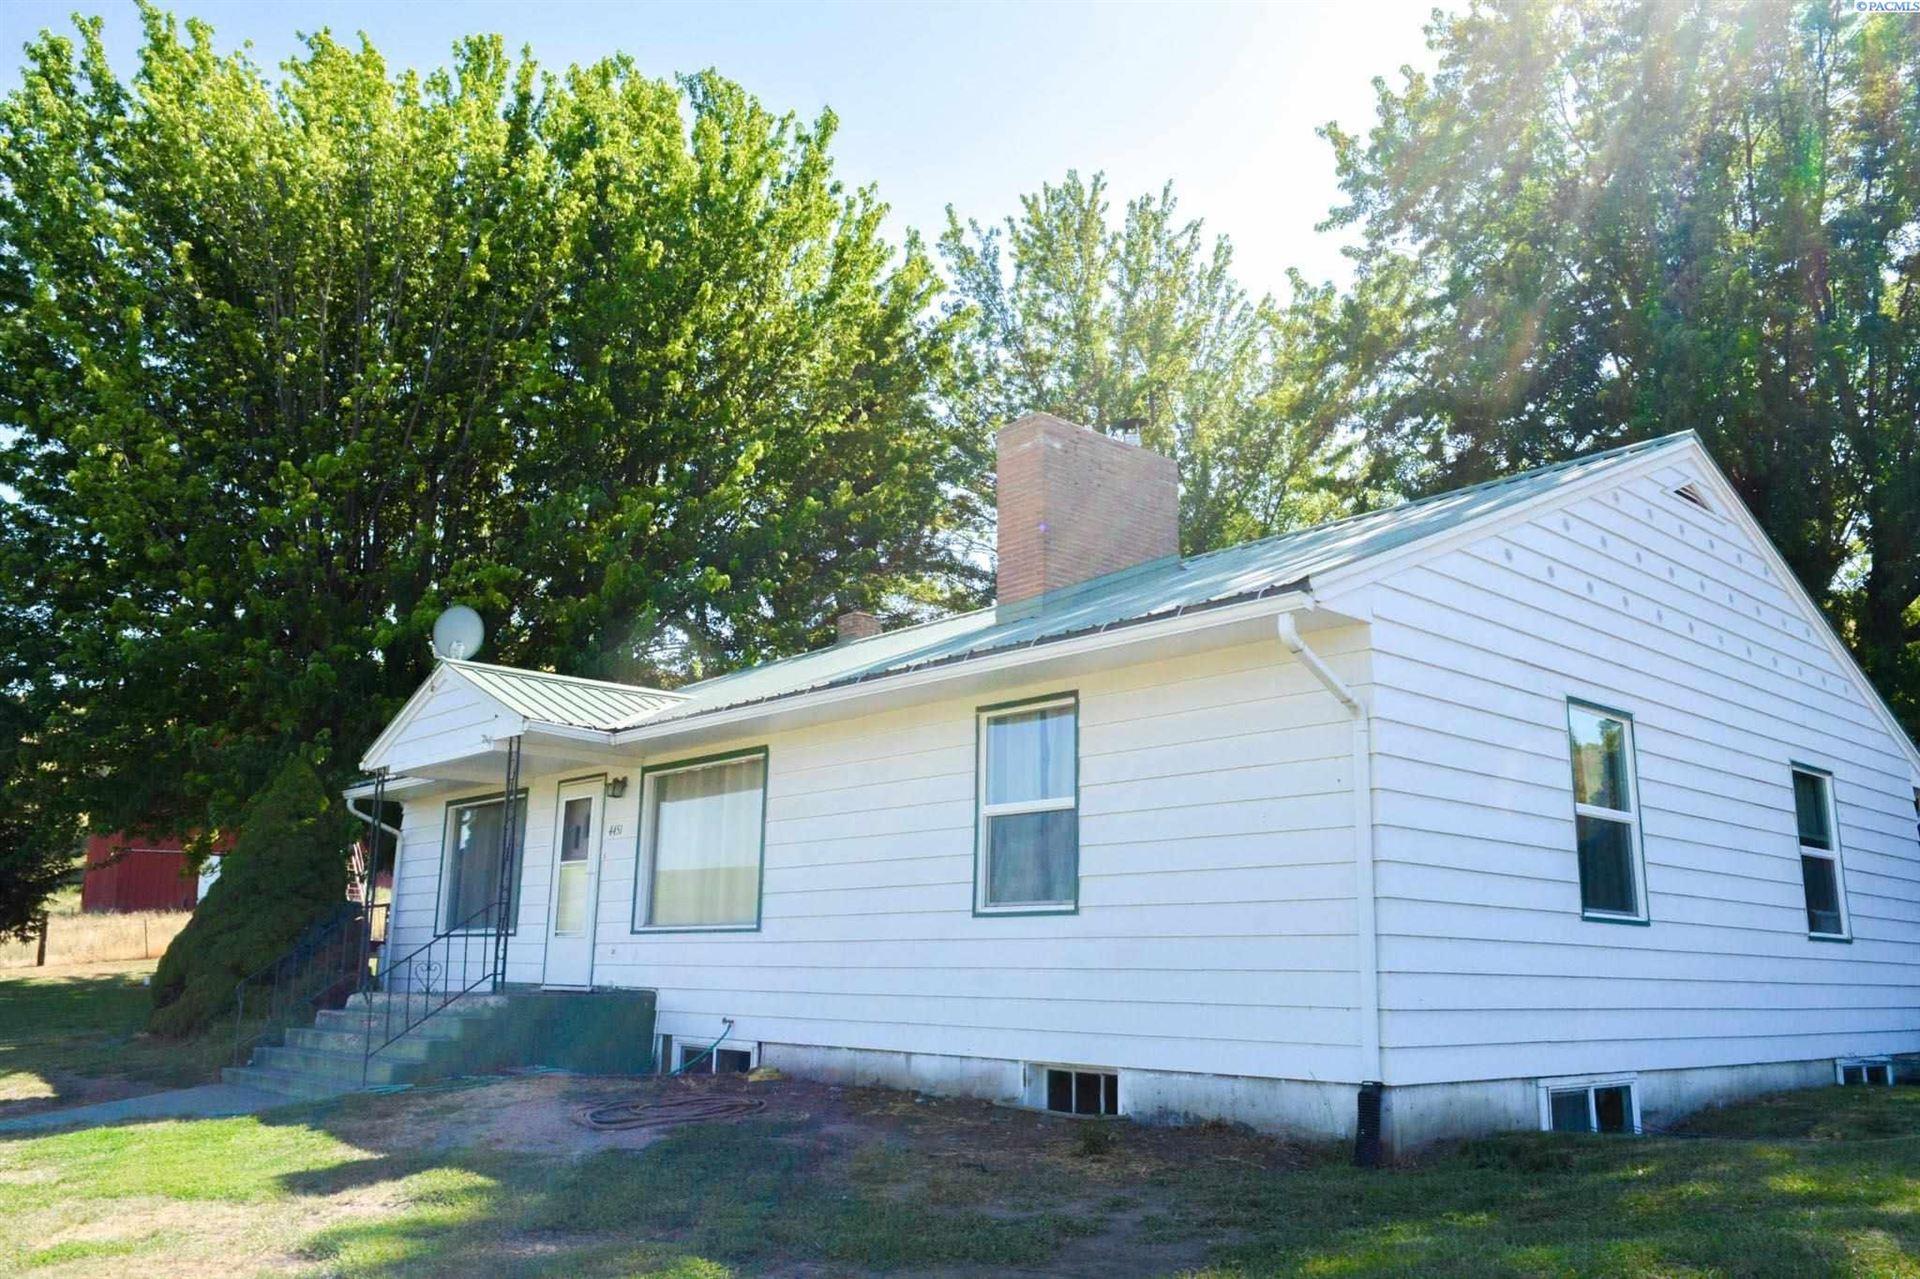 Photo of 4451 Ryan Road, Pullman, WA 99163 (MLS # 255043)